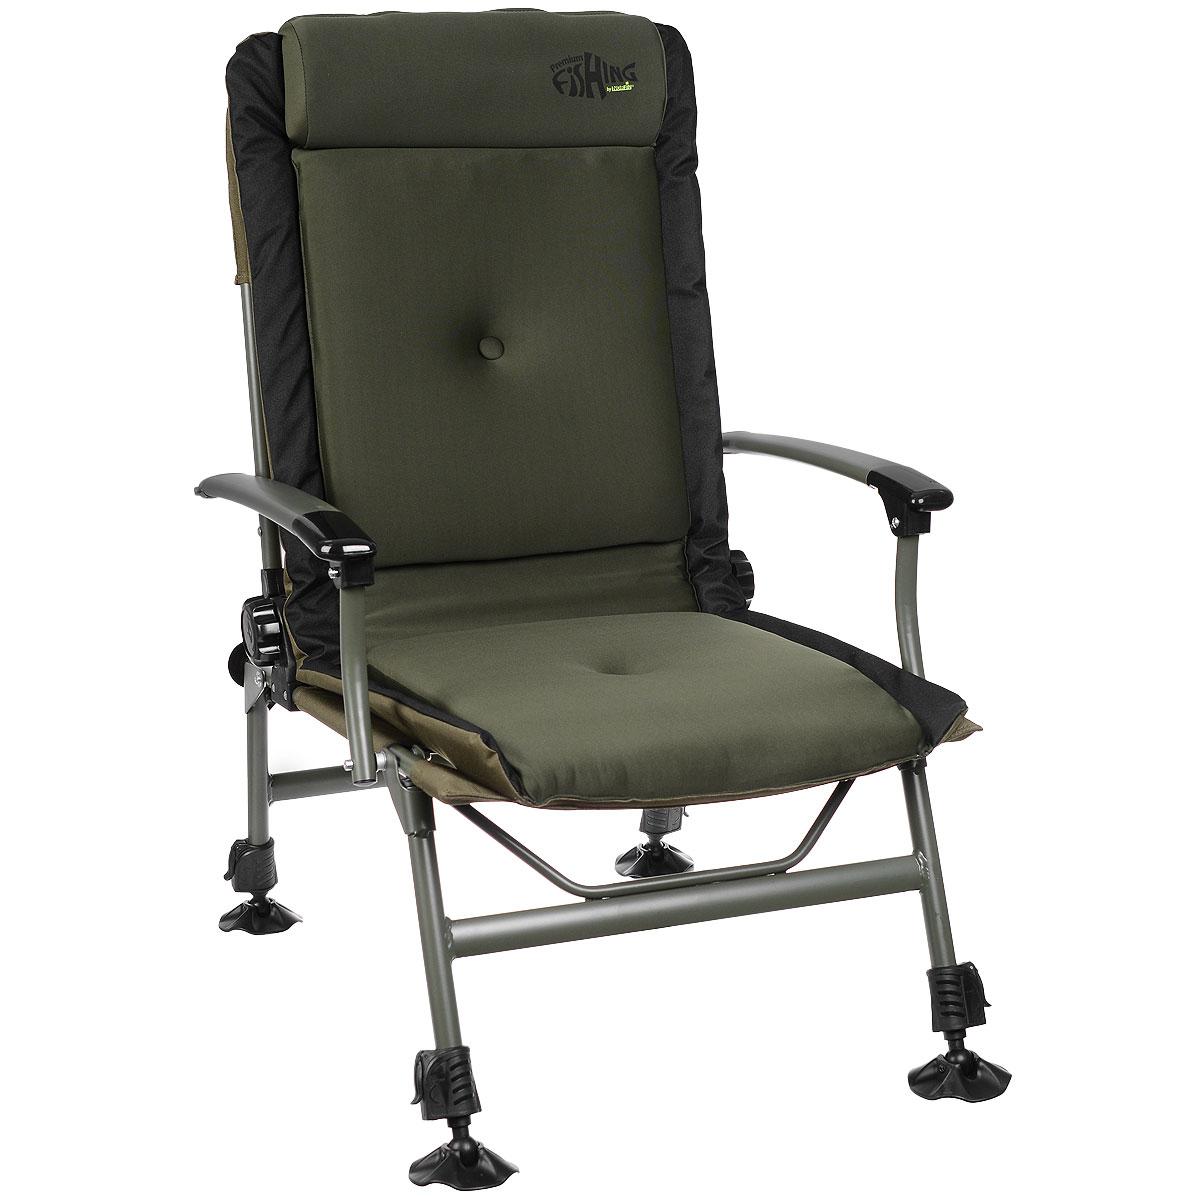 Кресло карповое Norfin Preston NF, цвет: хаки, 53 см х 50 см х 102 см black diamond primrose sa medium